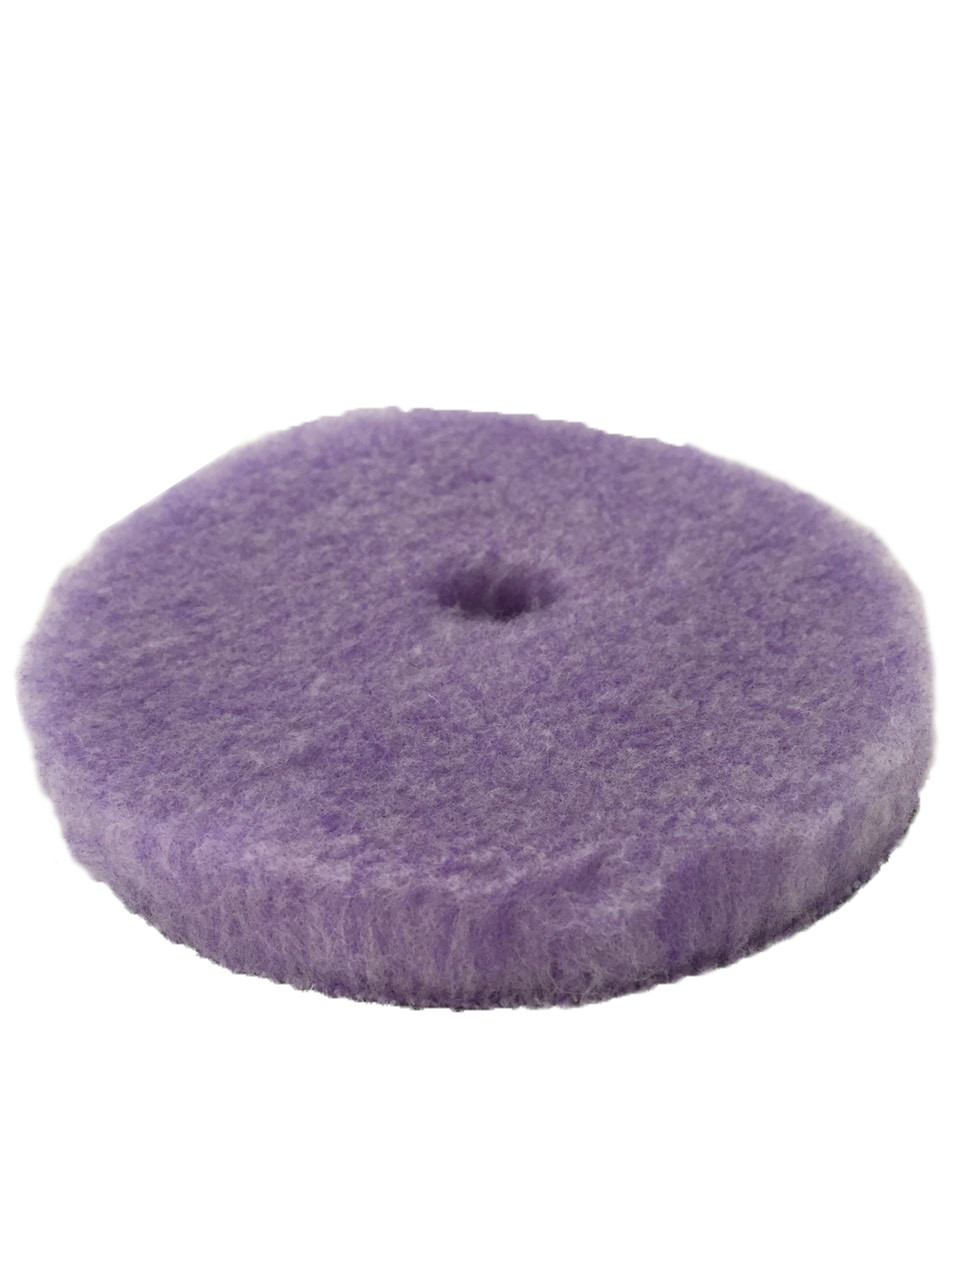 Полировальный круг гибридная шерсть - Lake Country Purple Foamed Wool Buffing/Polishing 125 мм. (58-32525WH-1)